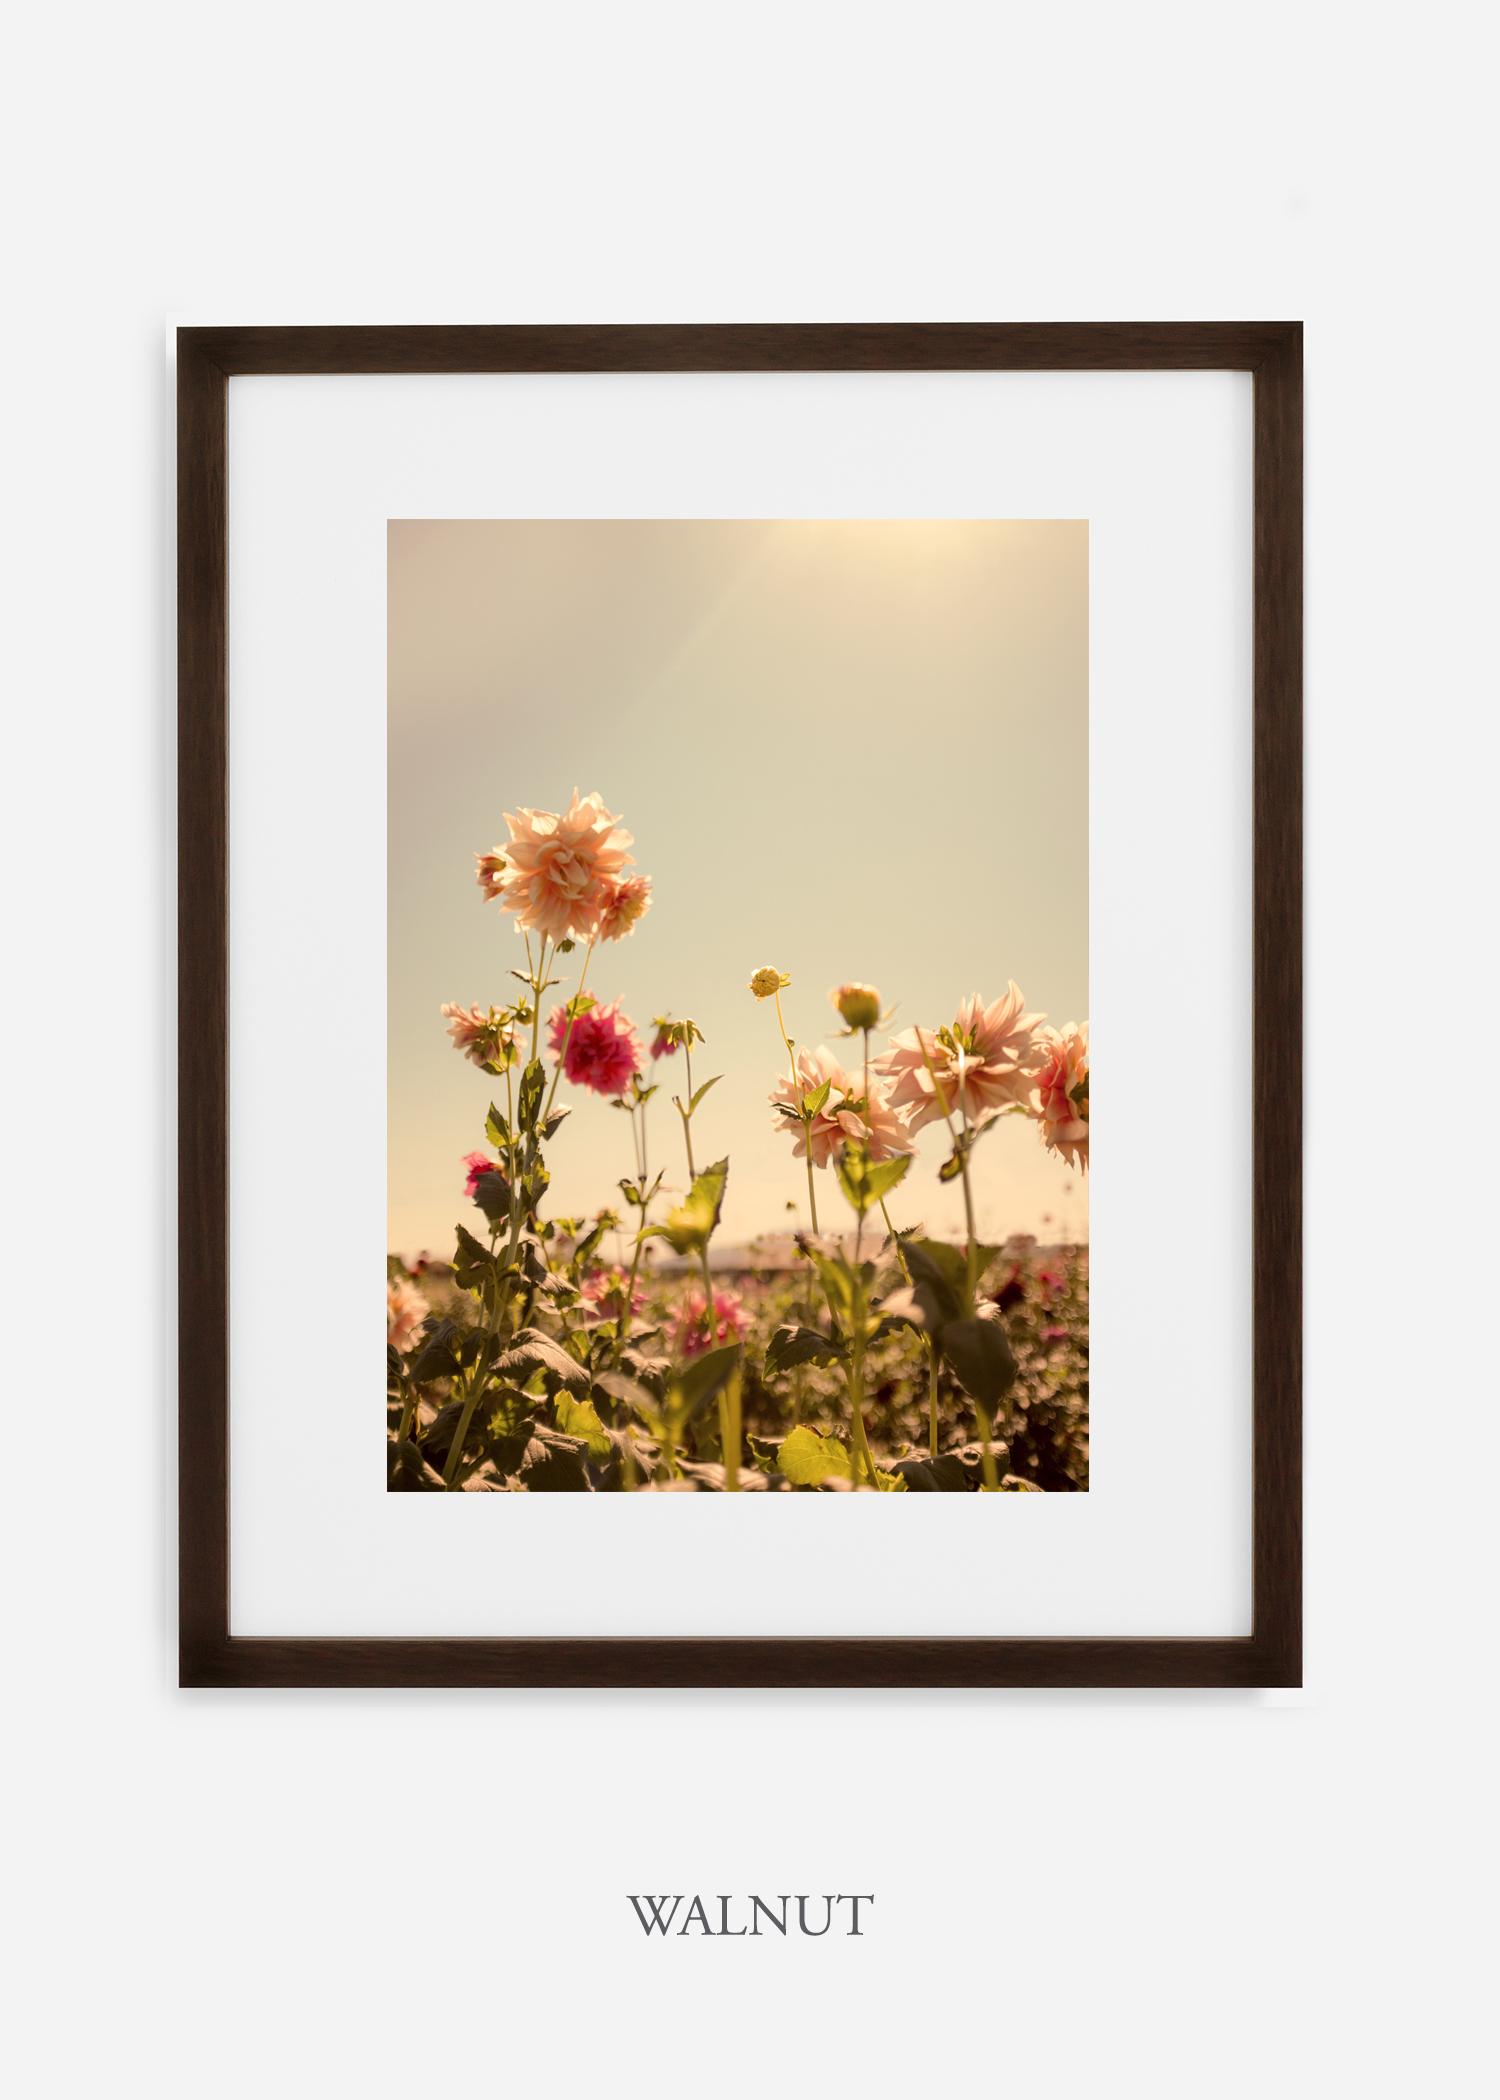 DahliaNo.3_walnutframe__mat_interiordesign_botanicalprint_art.jpg